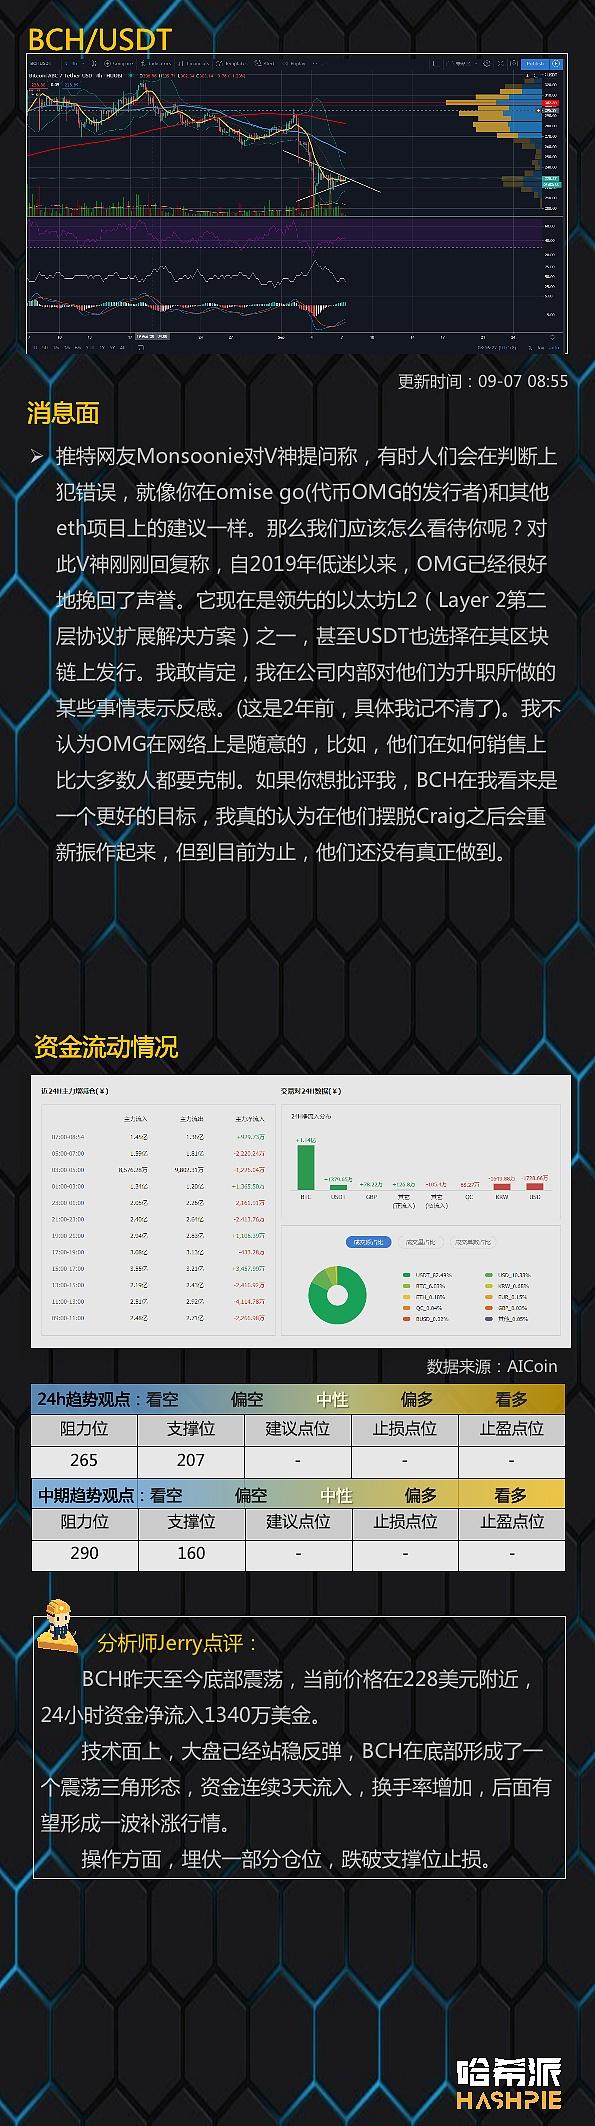 ChainUP 一站式交易所技术服务